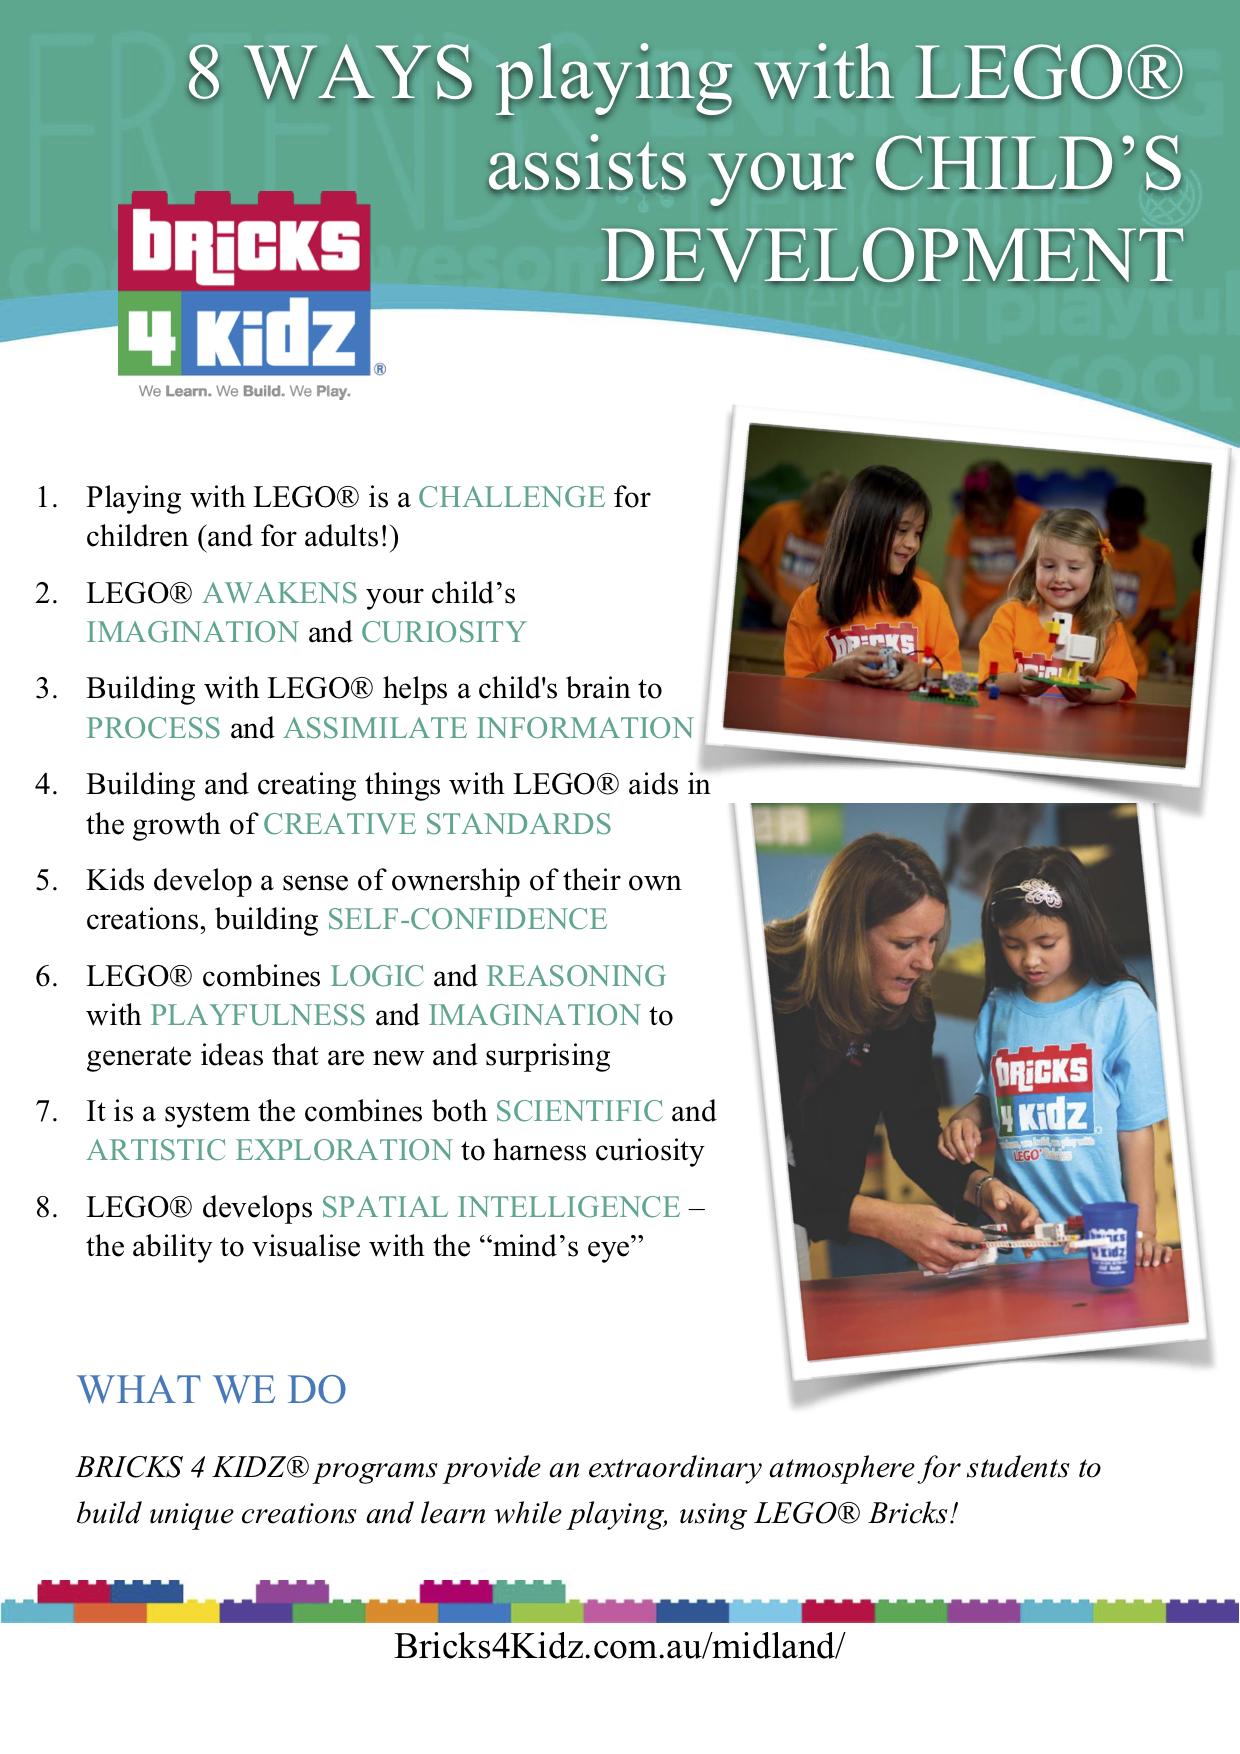 BRICKS 4 KIDZ Midland   8 Ways LEGO Assists Development